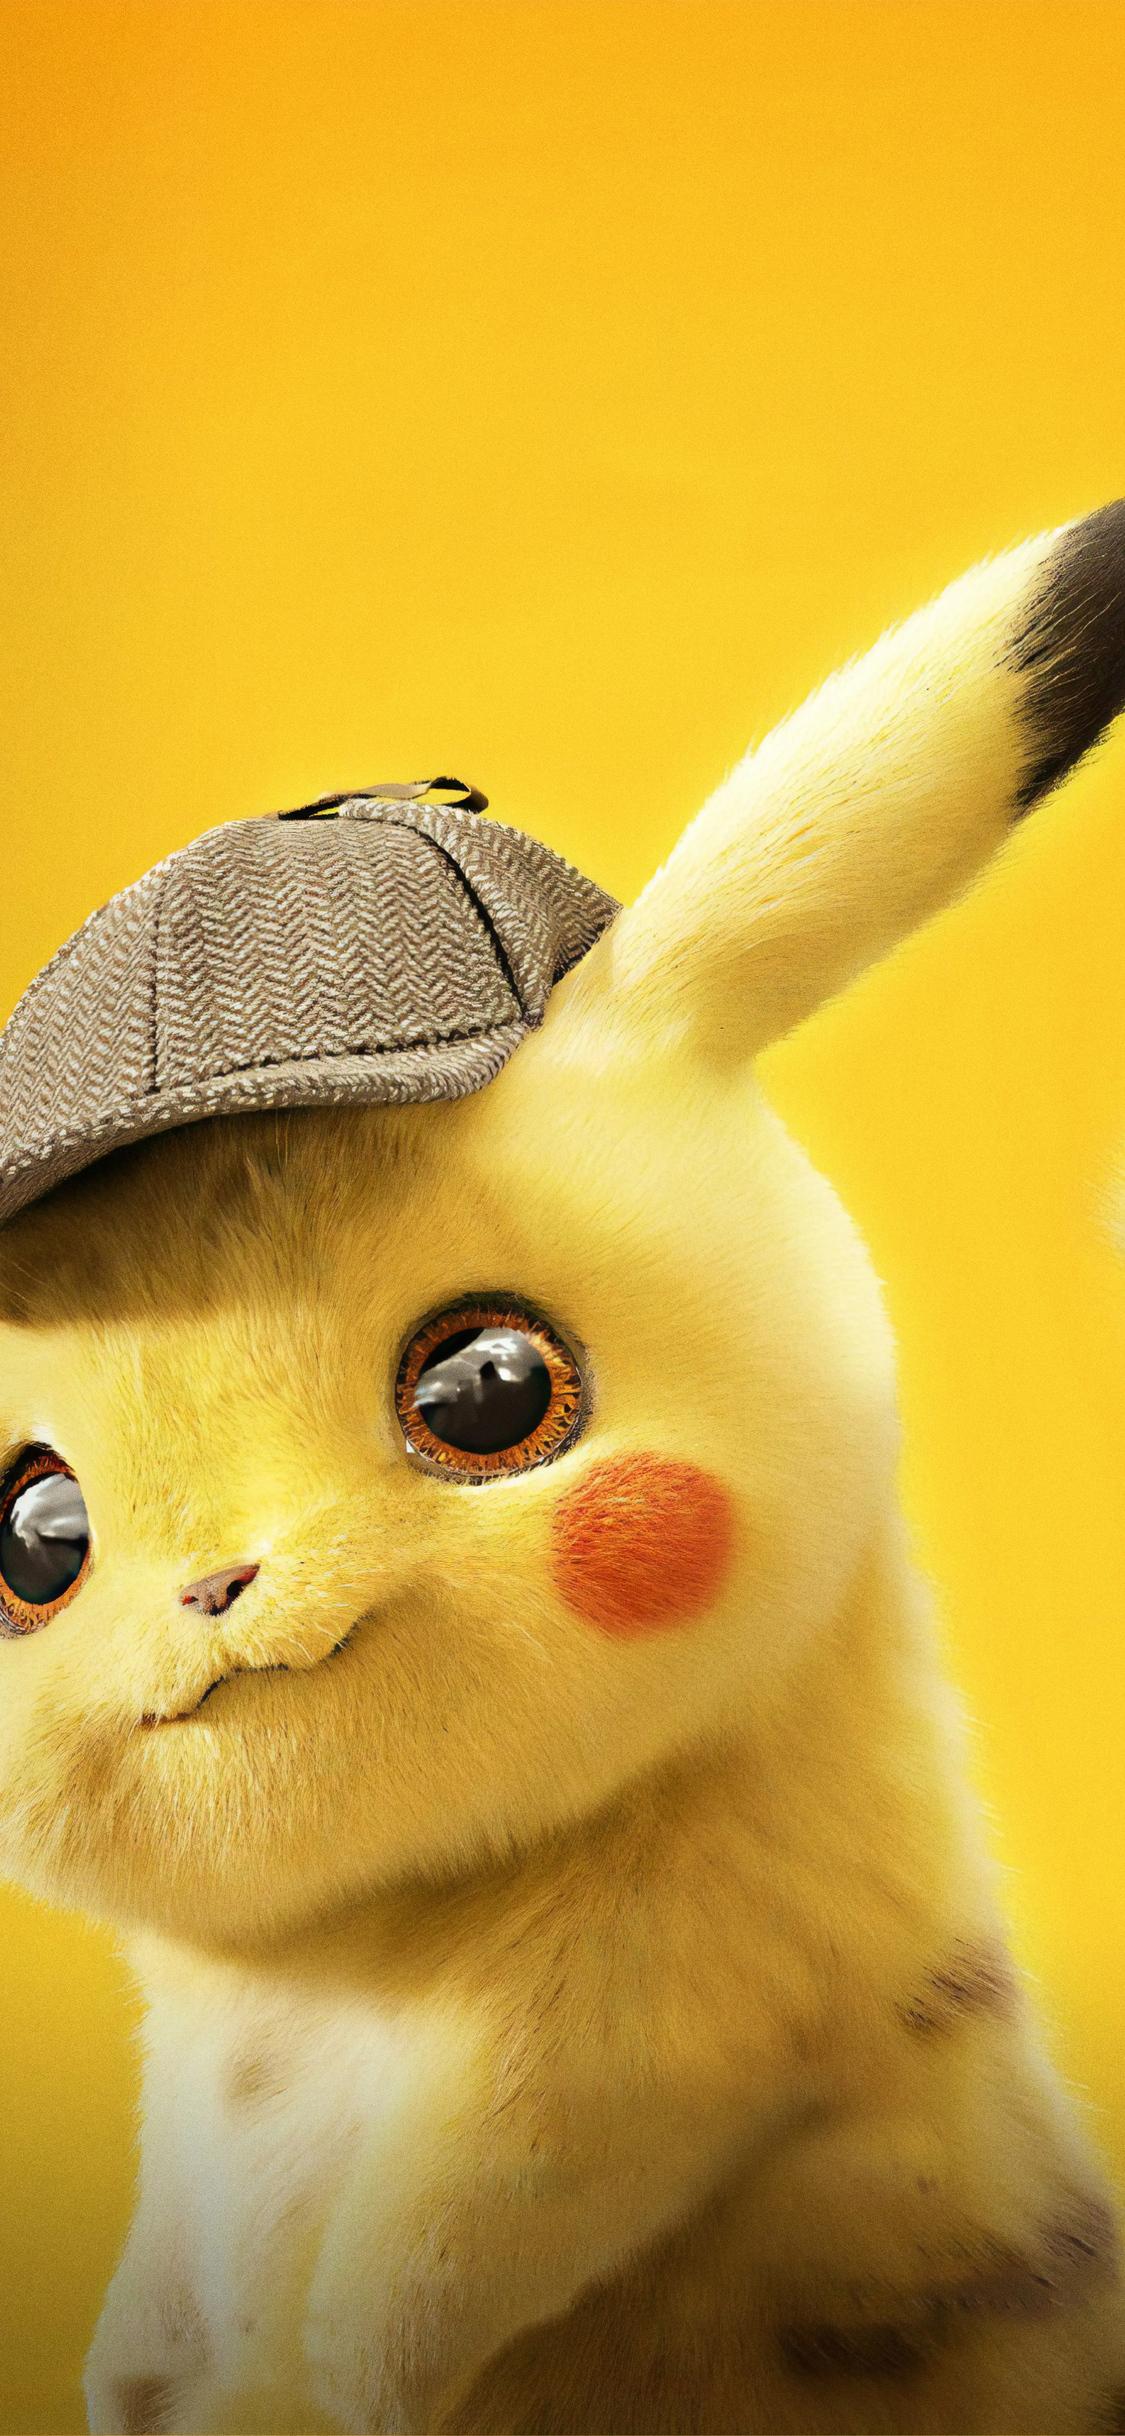 1125x2436 Pokemon Detective Pikachu 4k 2019 Iphone Xs Iphone